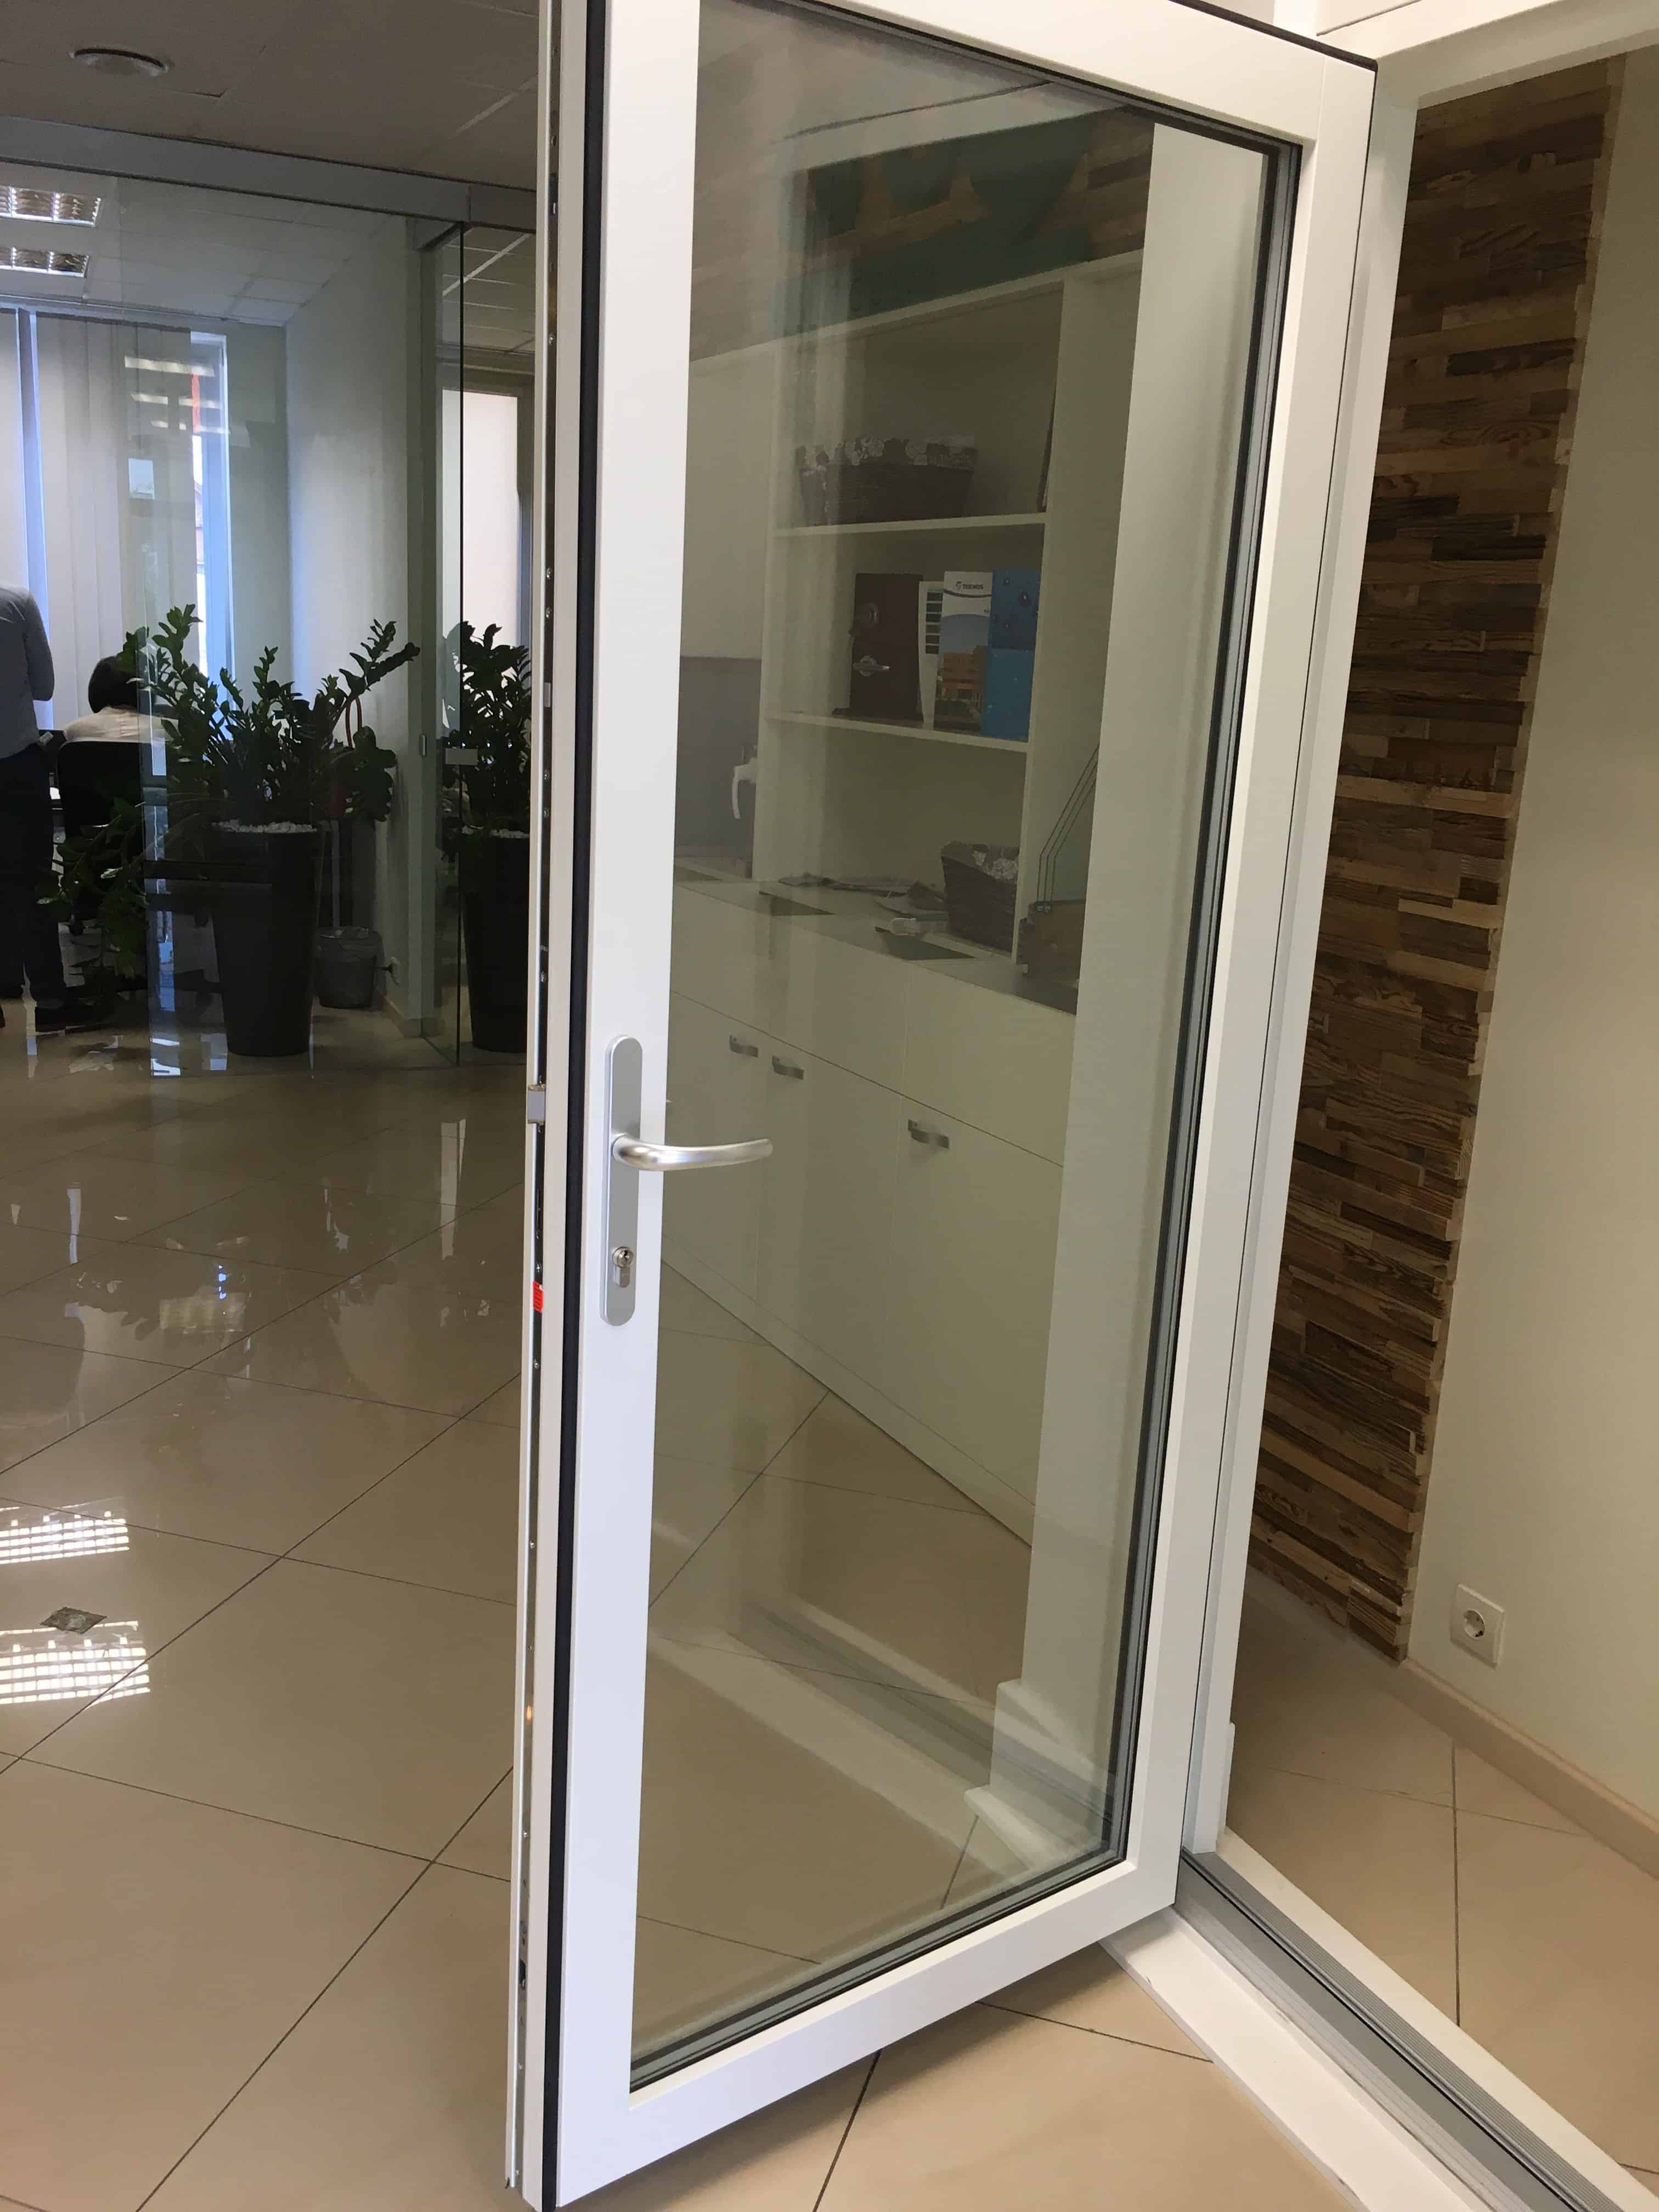 Tilt & Turn French Balcony Doors - Broxwood Windows & Doors Balcony Doors French on